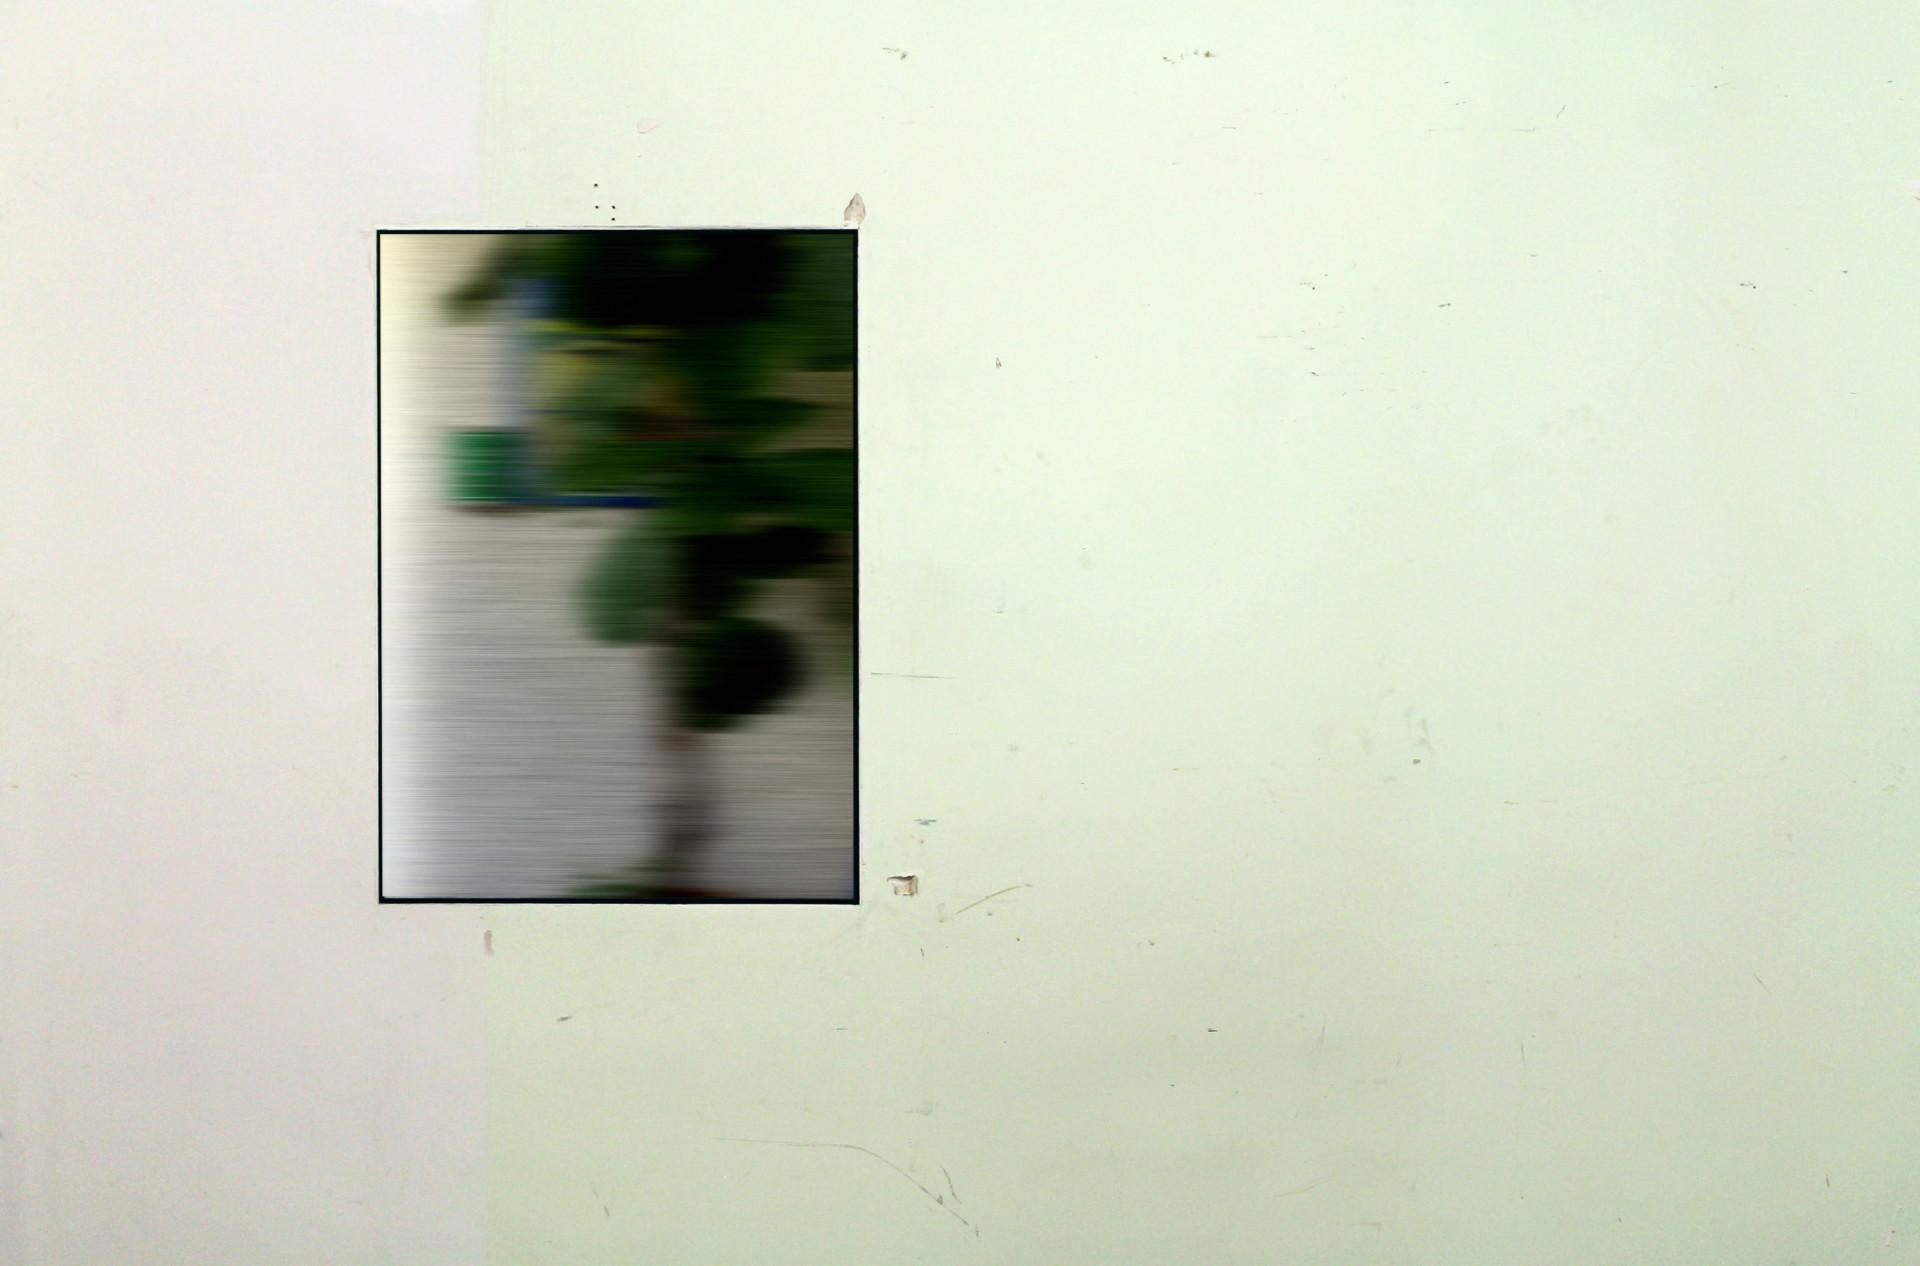 luca vanello Resting / Courtship